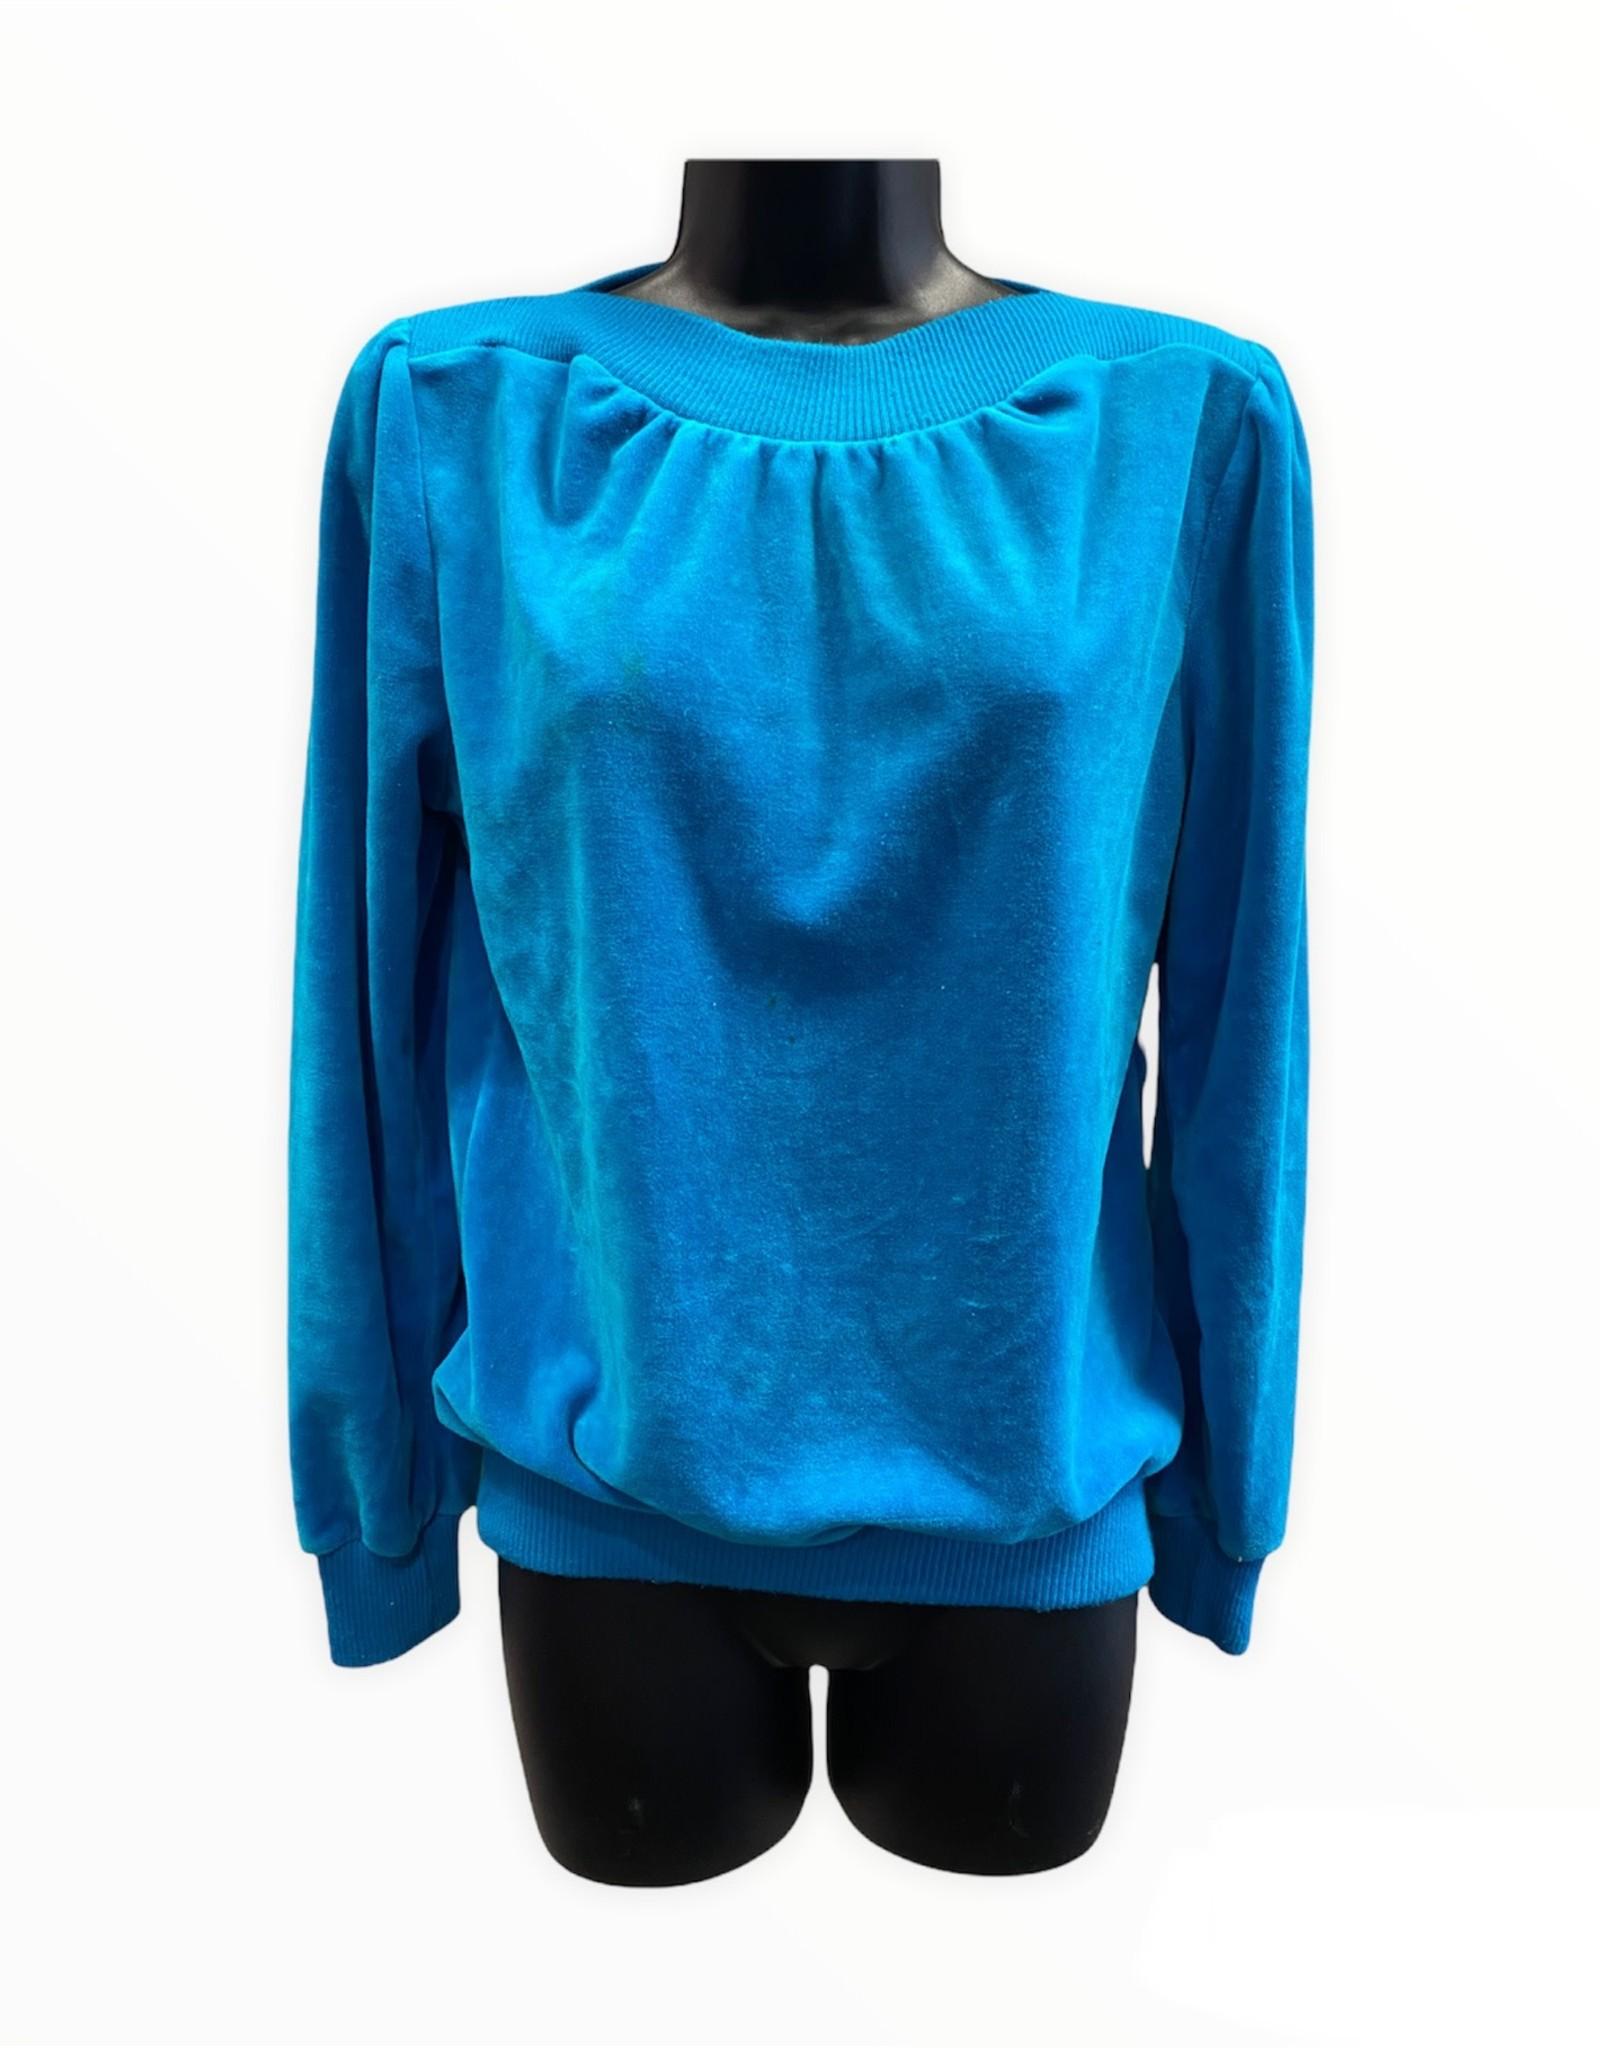 Sears 70s turquoise velour sweatshirt sz S